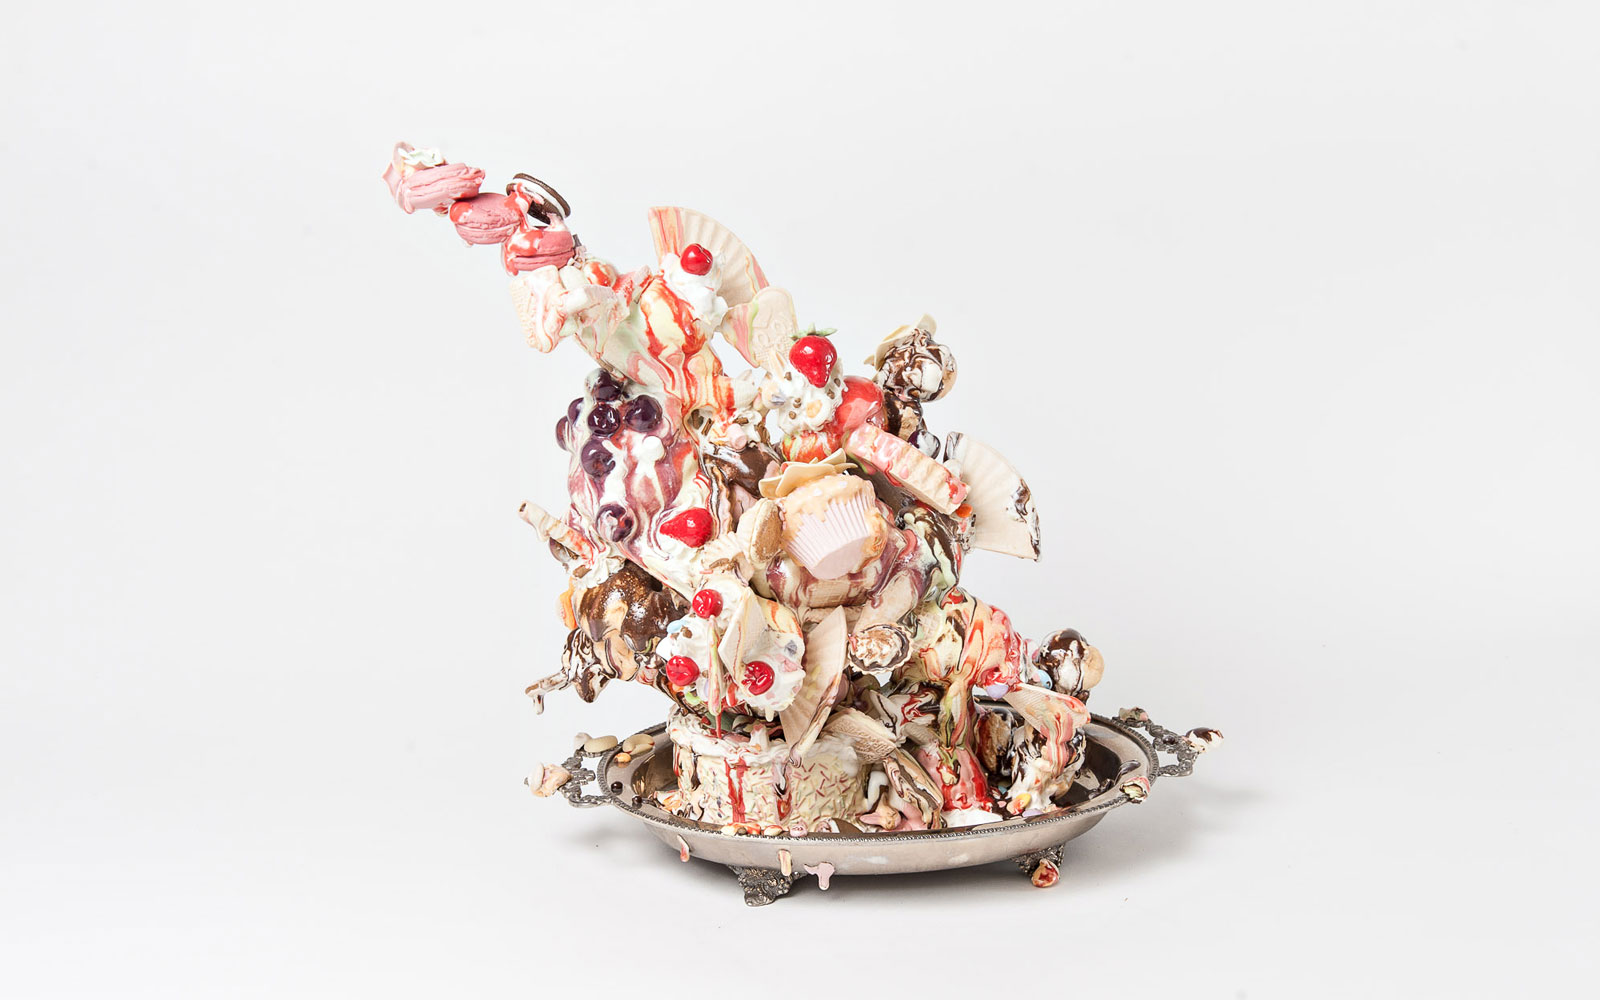 FI-anna-barlow-ceramics-ice-cream-01.jpg